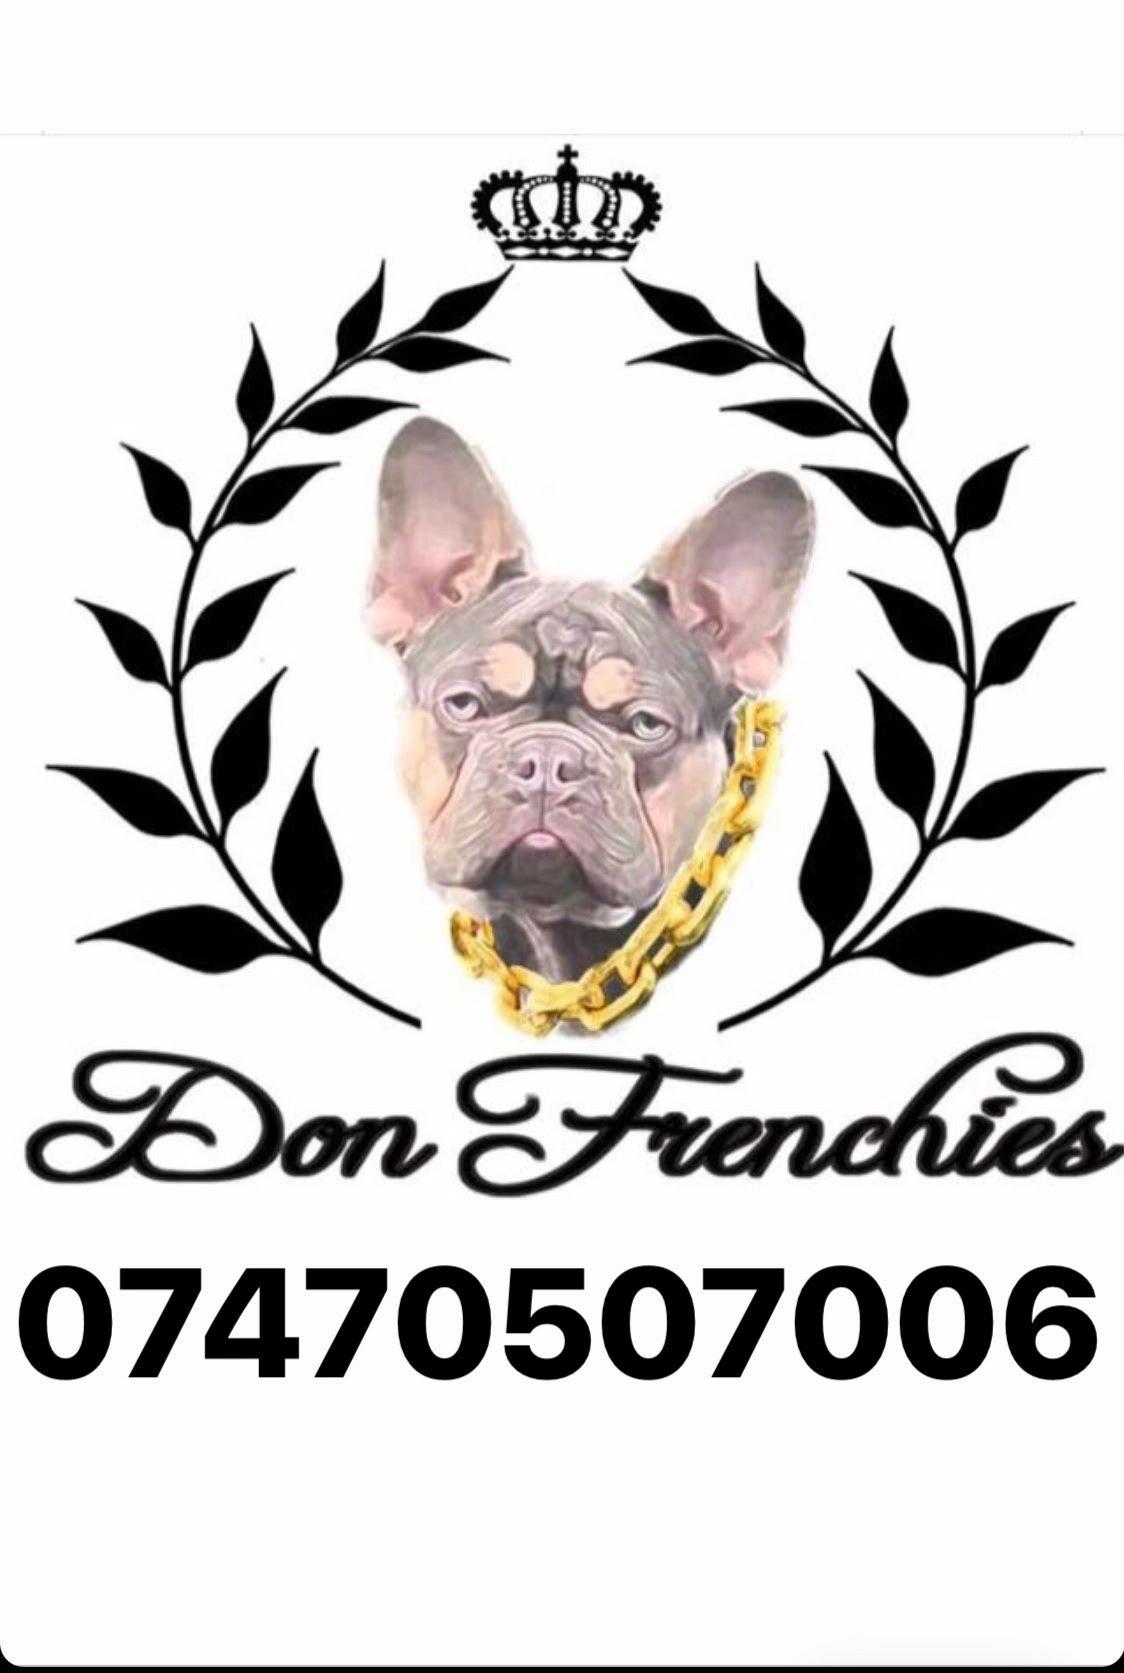 Donfrenchies French Bulldogs Junior Obeng Donfrenchies